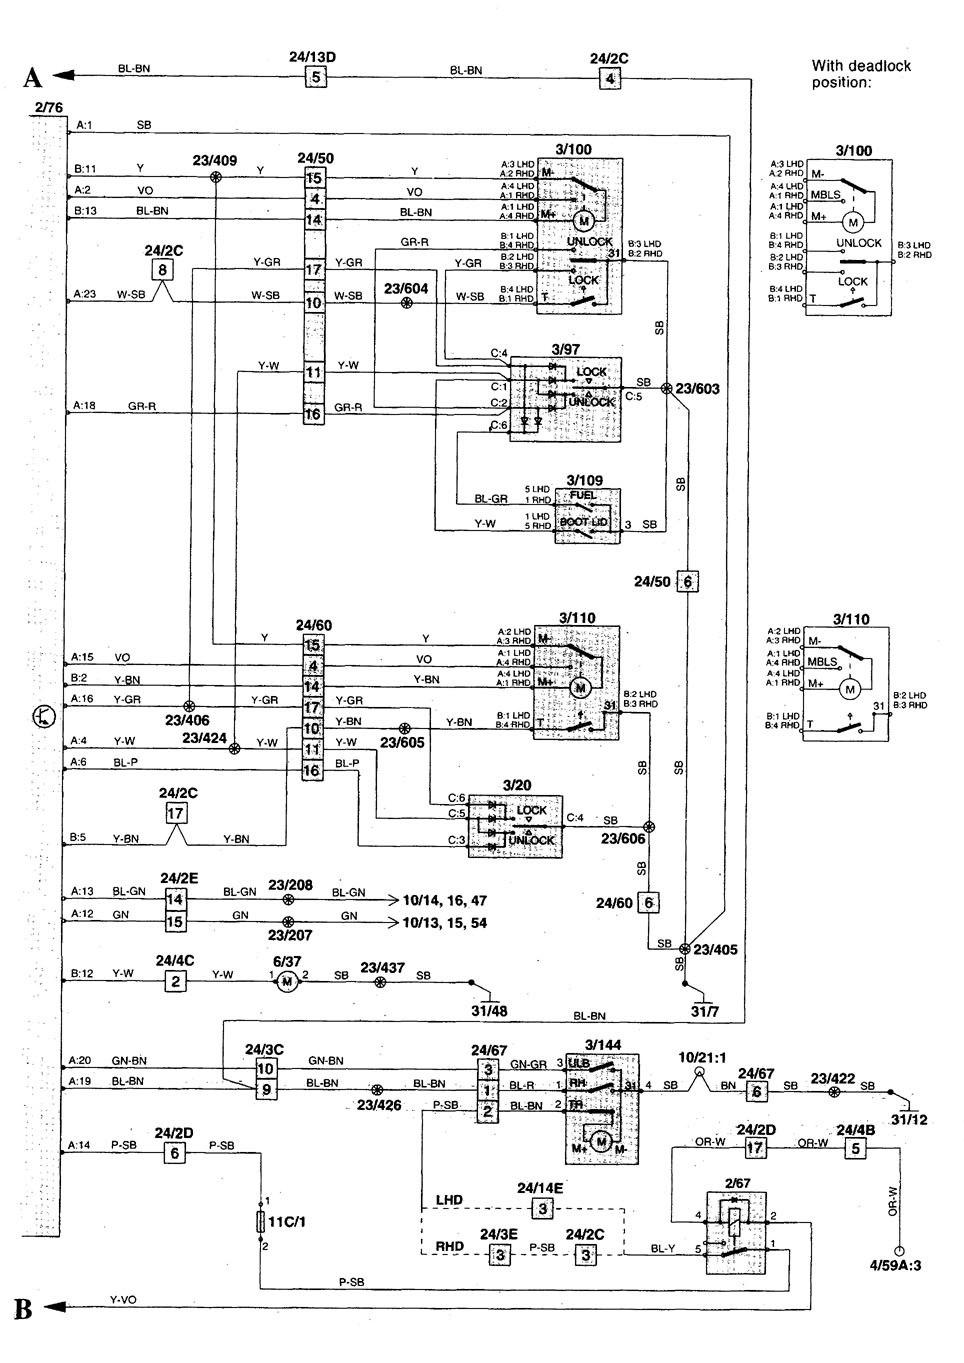 volvo truck wg64t wiring diagrams, volvo vn truck wiring diagrams, 2001 ford truck wiring diagrams, heavy truck wiring diagrams, 2002 volvo truck wiring diagrams, volvo 850 radio wiring diagram, ford f800 truck wiring diagrams, volvo d13 engine fault codes, mack truck cooling system diagrams, 2006 volvo truck wiring diagrams, ford f600 truck wiring diagrams, volvo d13 service manual, volvo fuel pump wiring diagram, 2005 volvo truck wiring diagrams, semi truck wiring diagrams, volvo s80 wiring diagram, volvo s70 wiring-diagram, 1957 gmc truck wiring diagrams, volvo d12 engine brake diagram, 2004 volvo truck wiring diagrams, on volvo vnl truck wiring diagrams